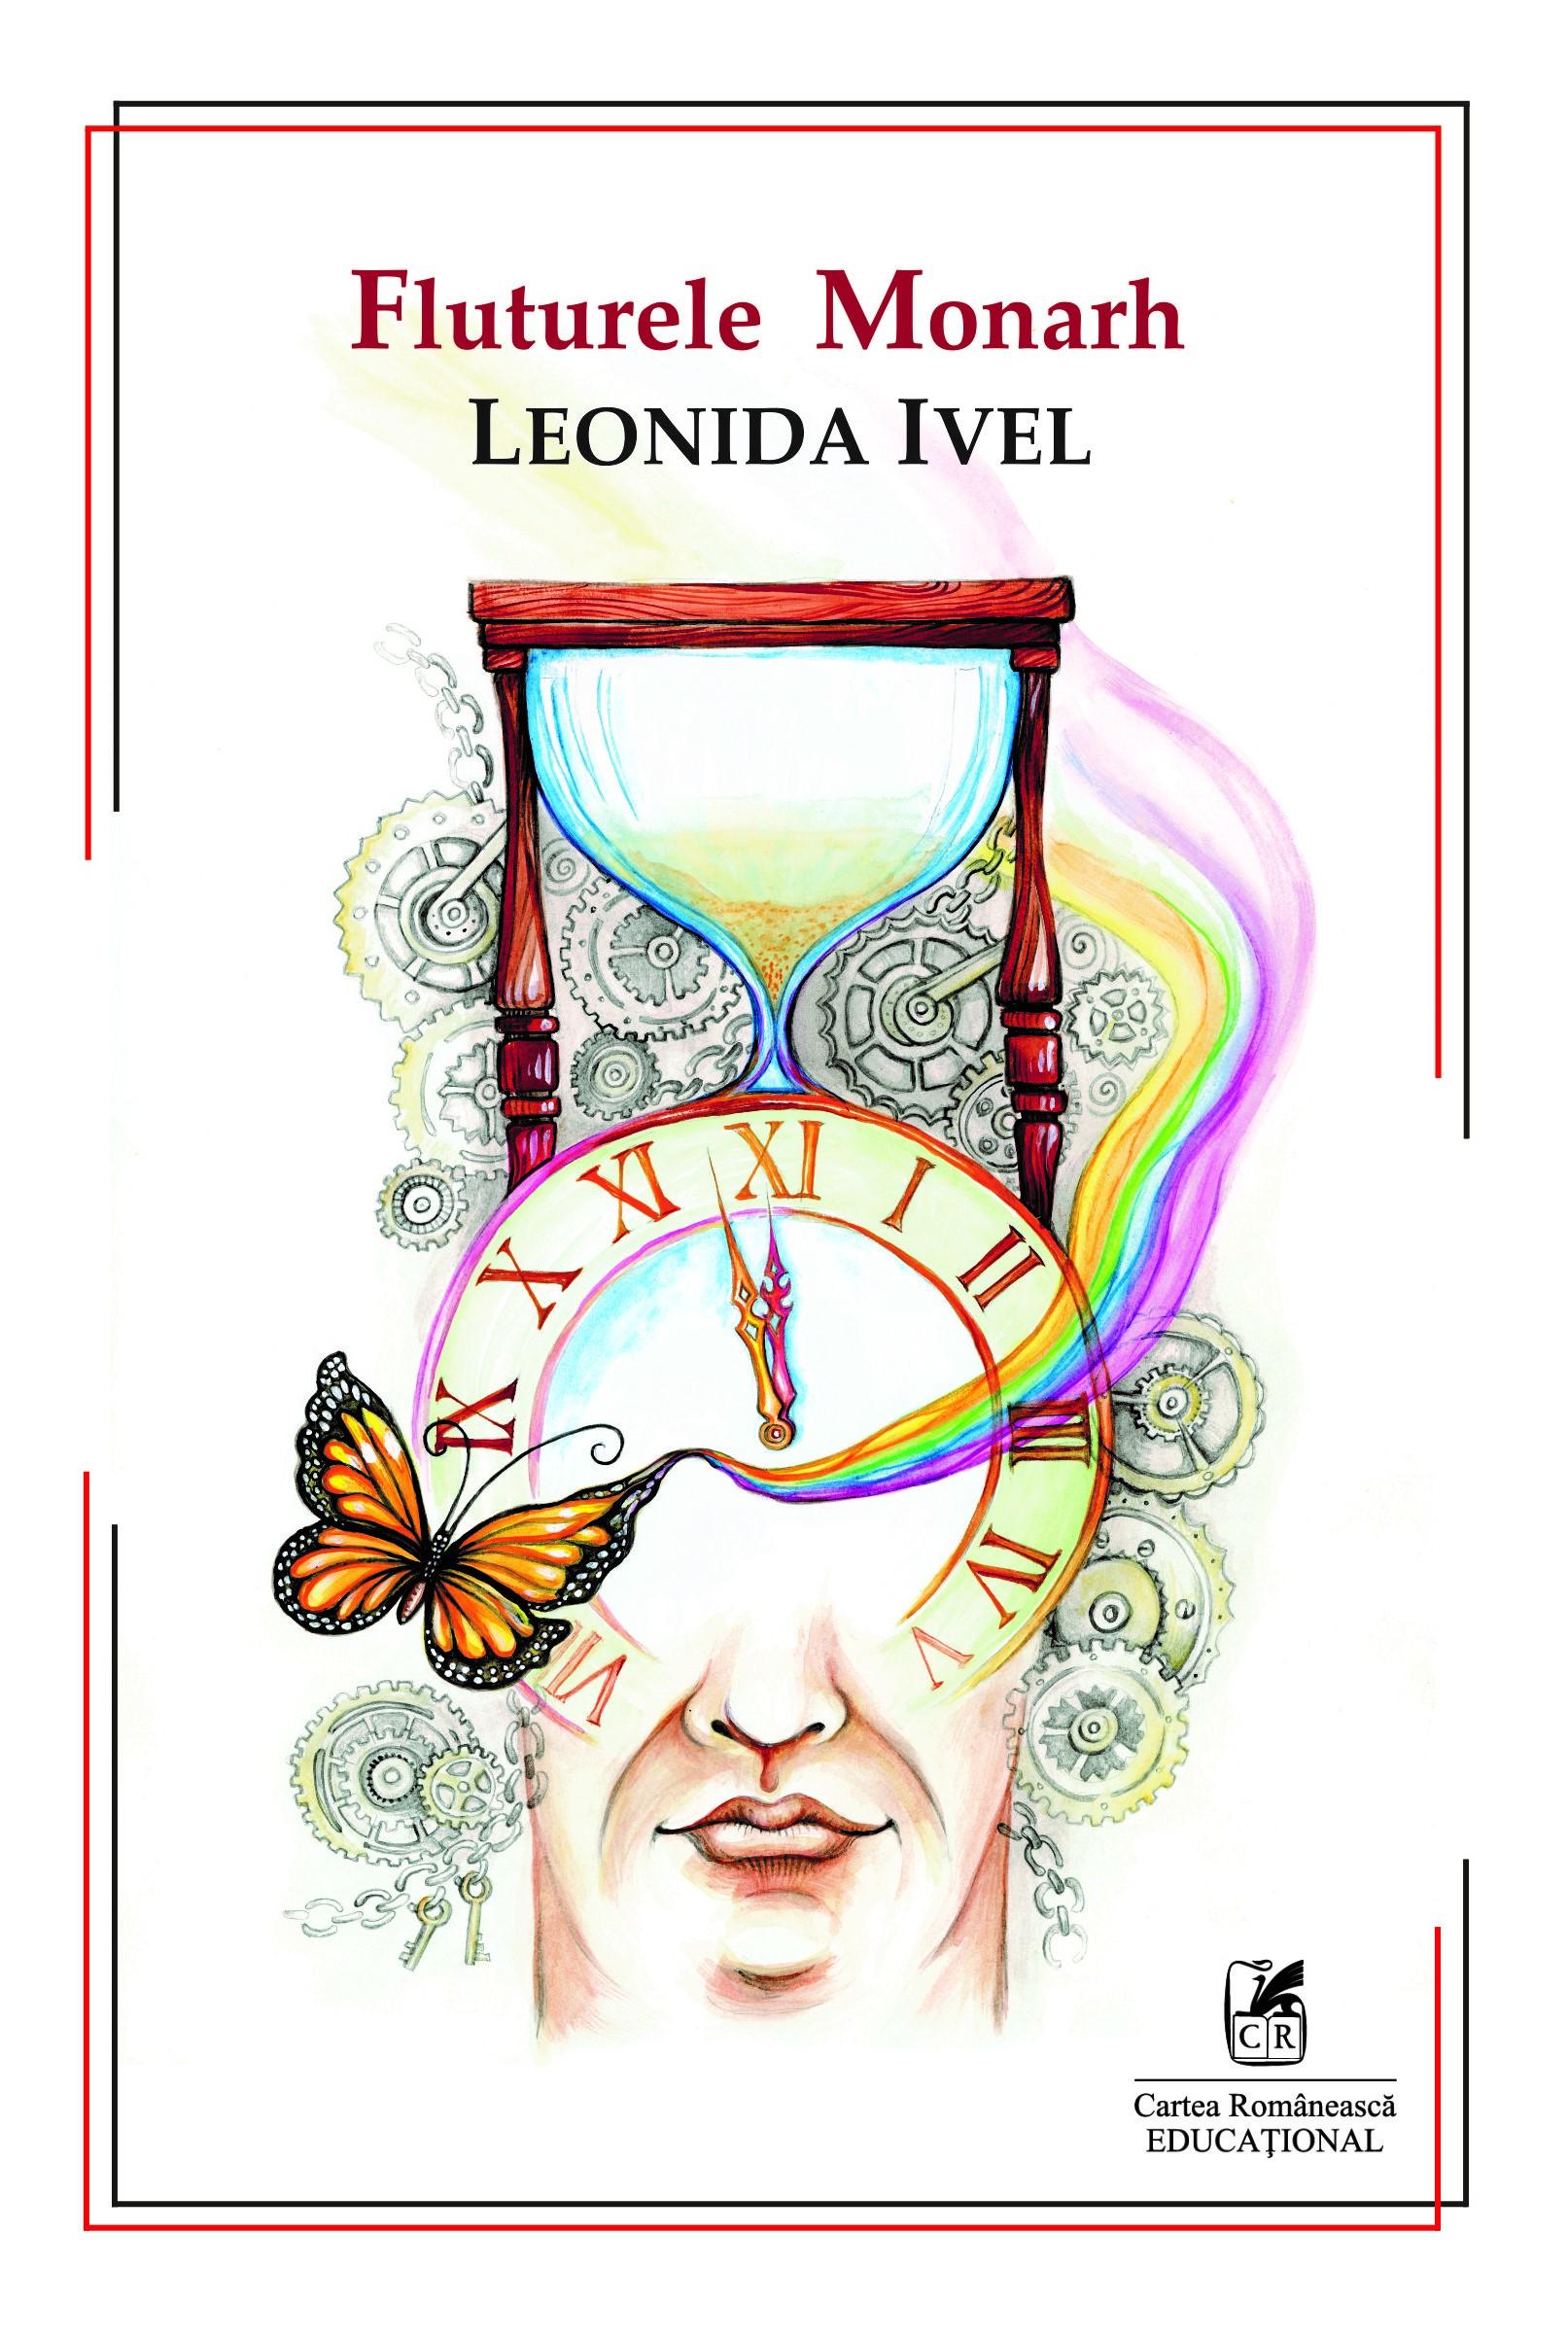 Fluturele Monarh | Leonida Ivel